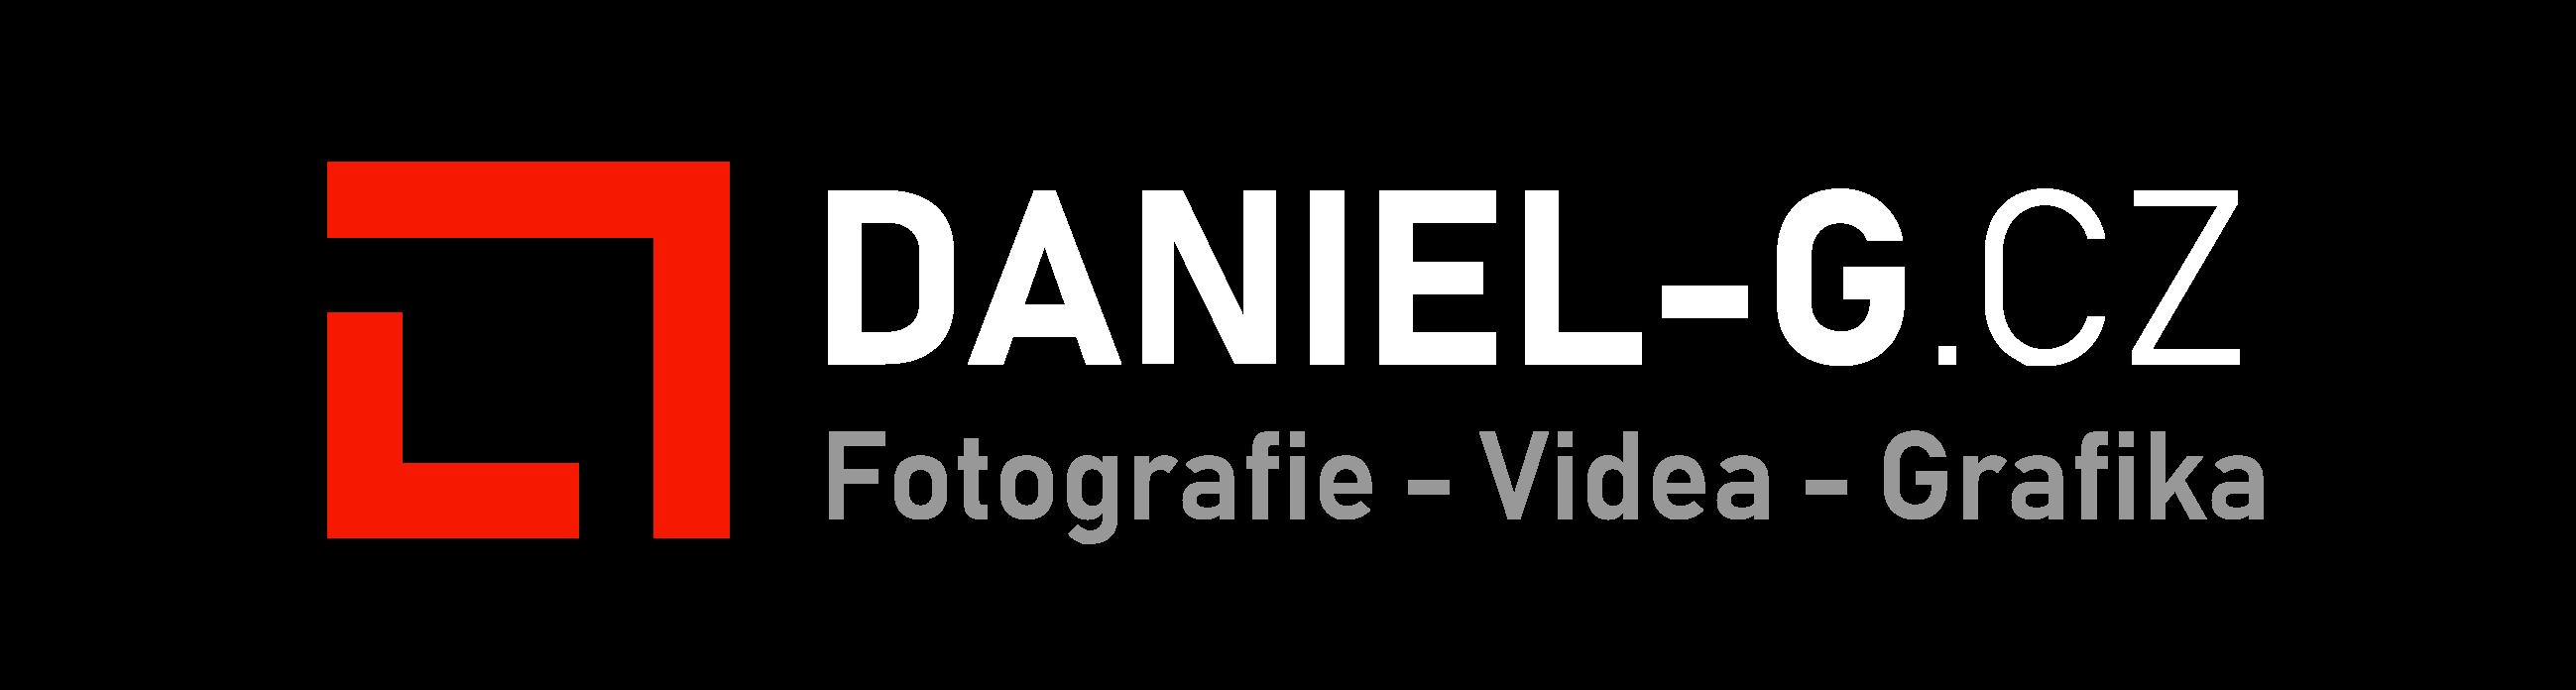 Daniel-G.cz